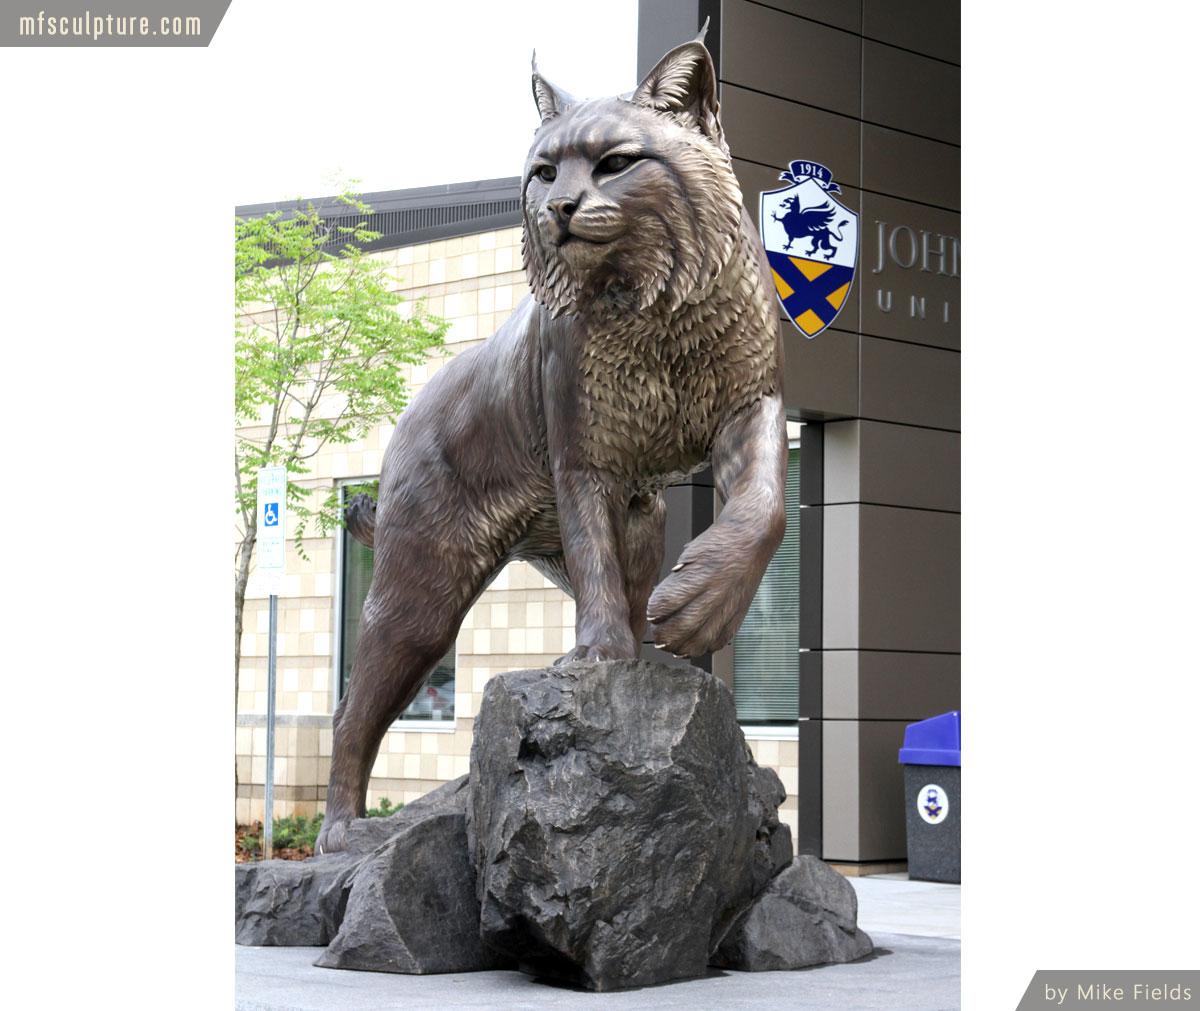 JWU University Mascot Statue Monument Realism